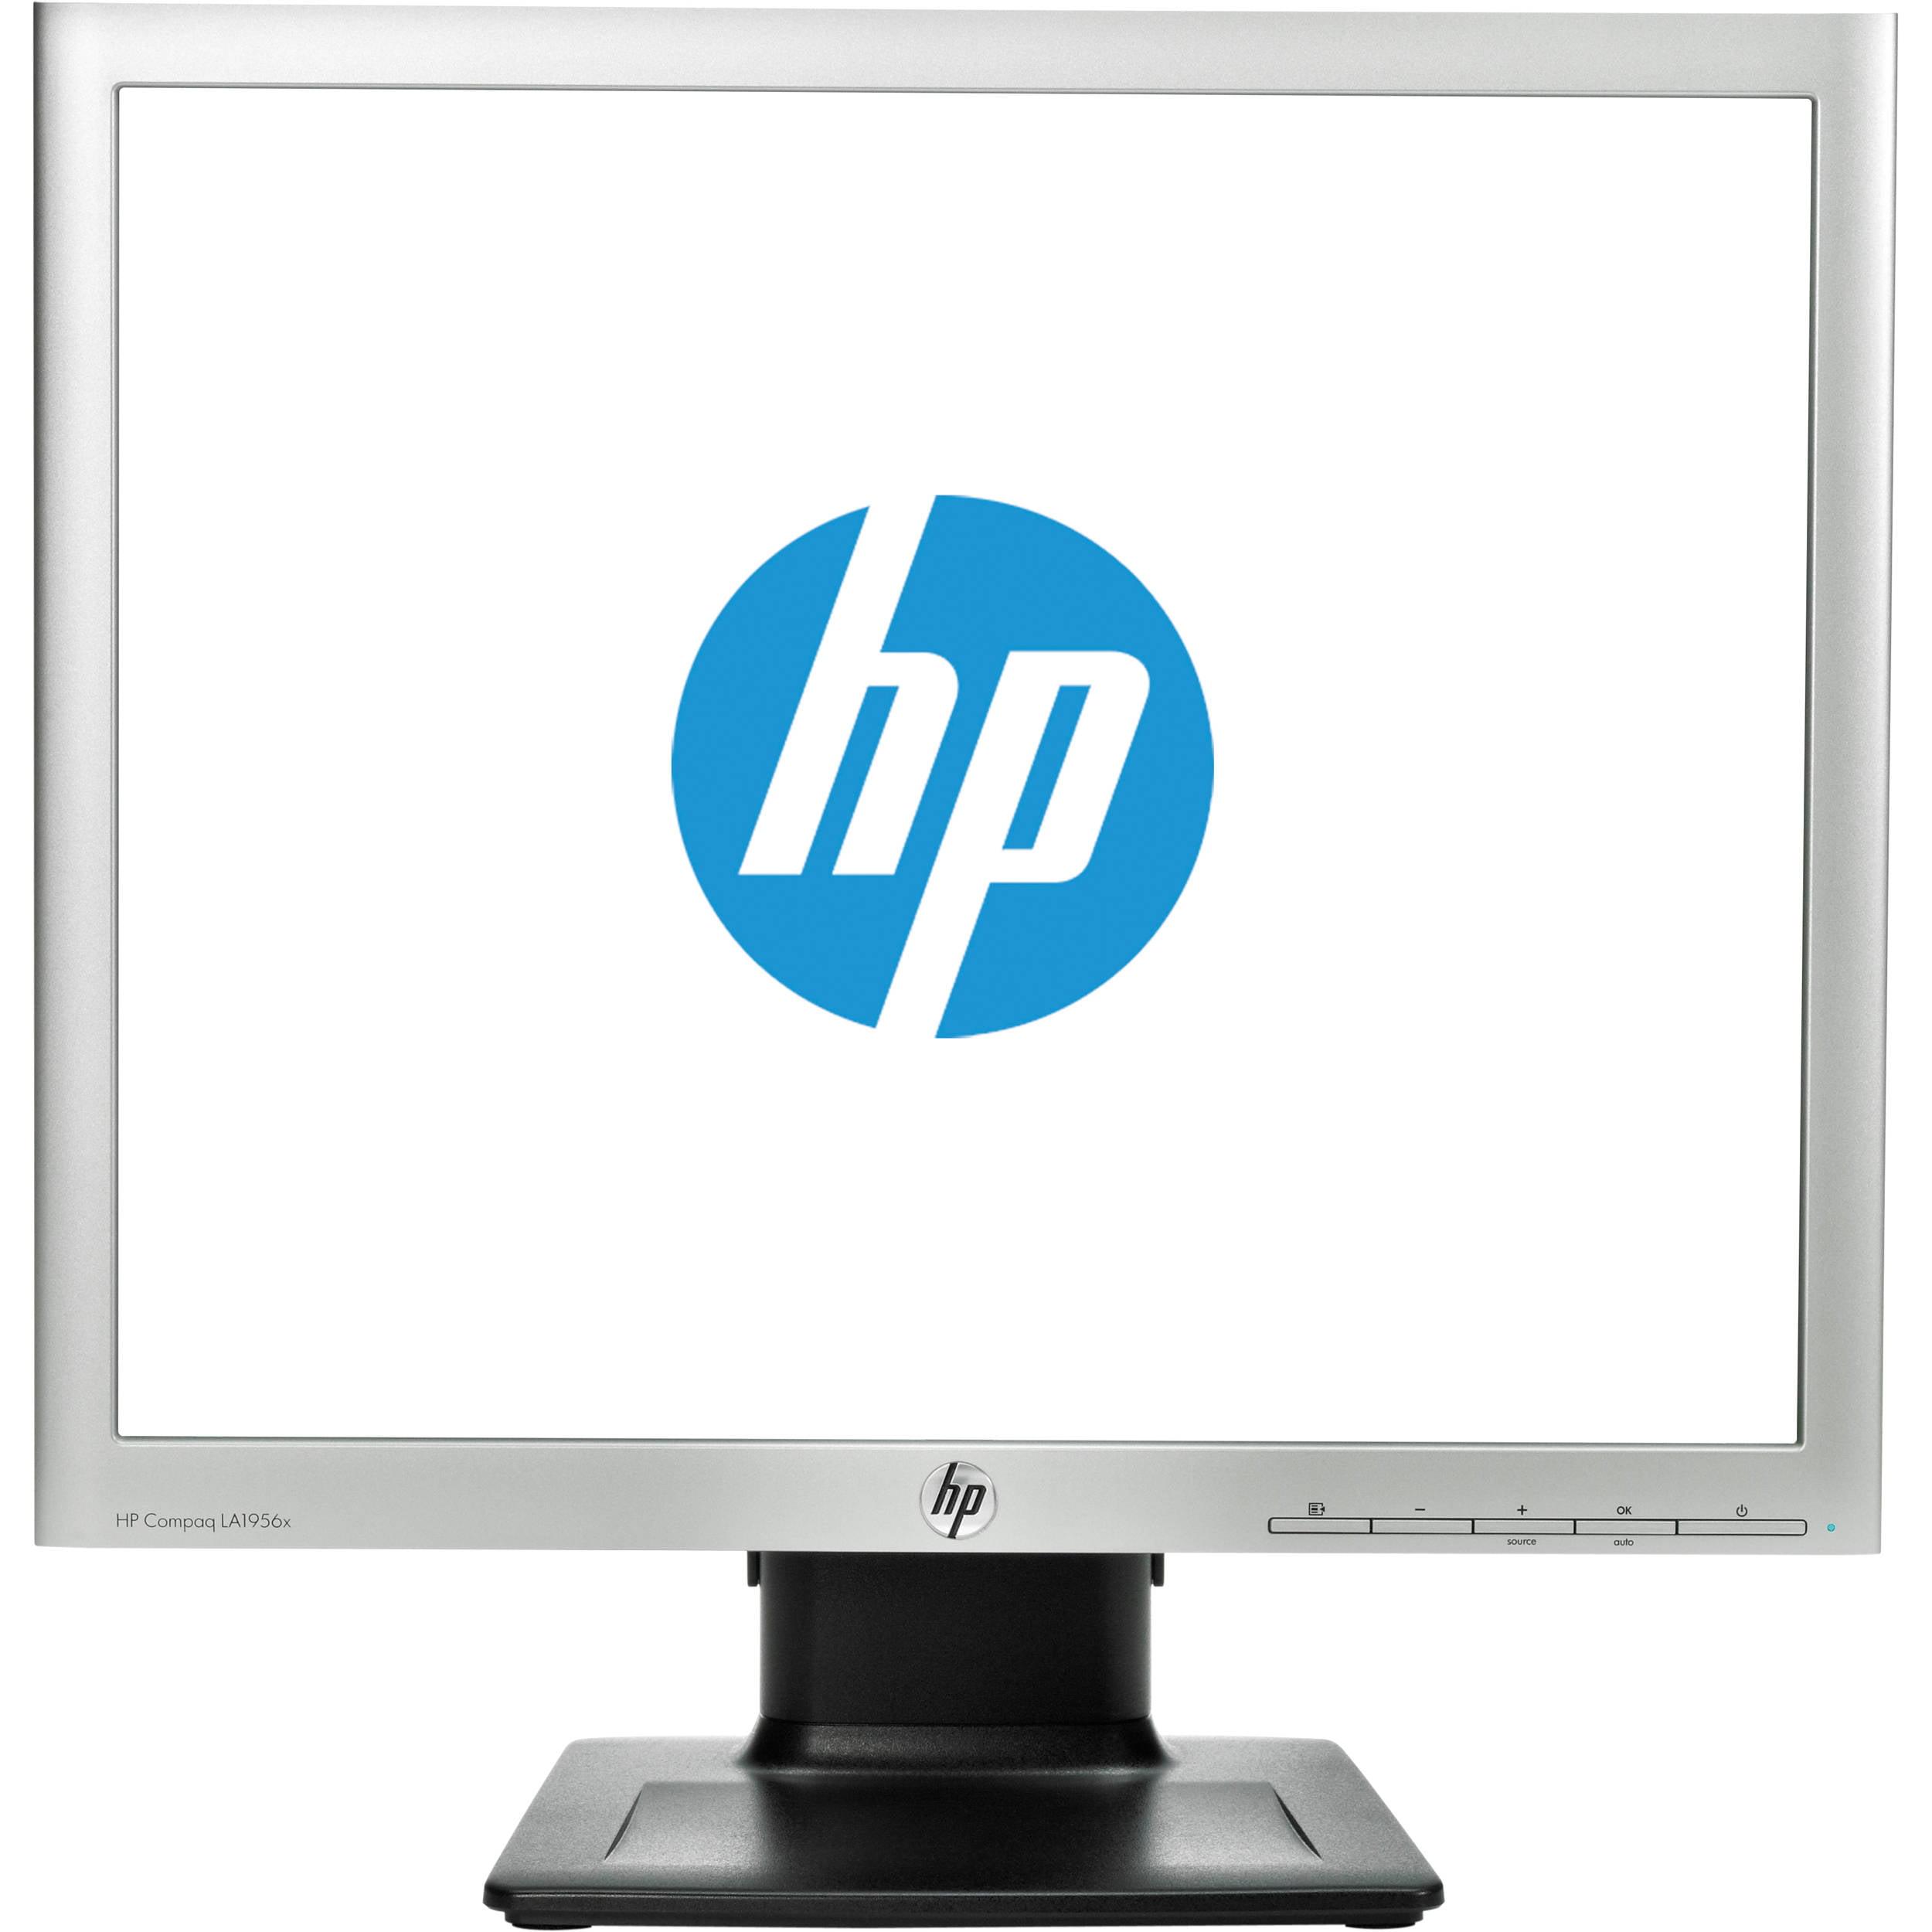 HP Compaq LA1956x 19